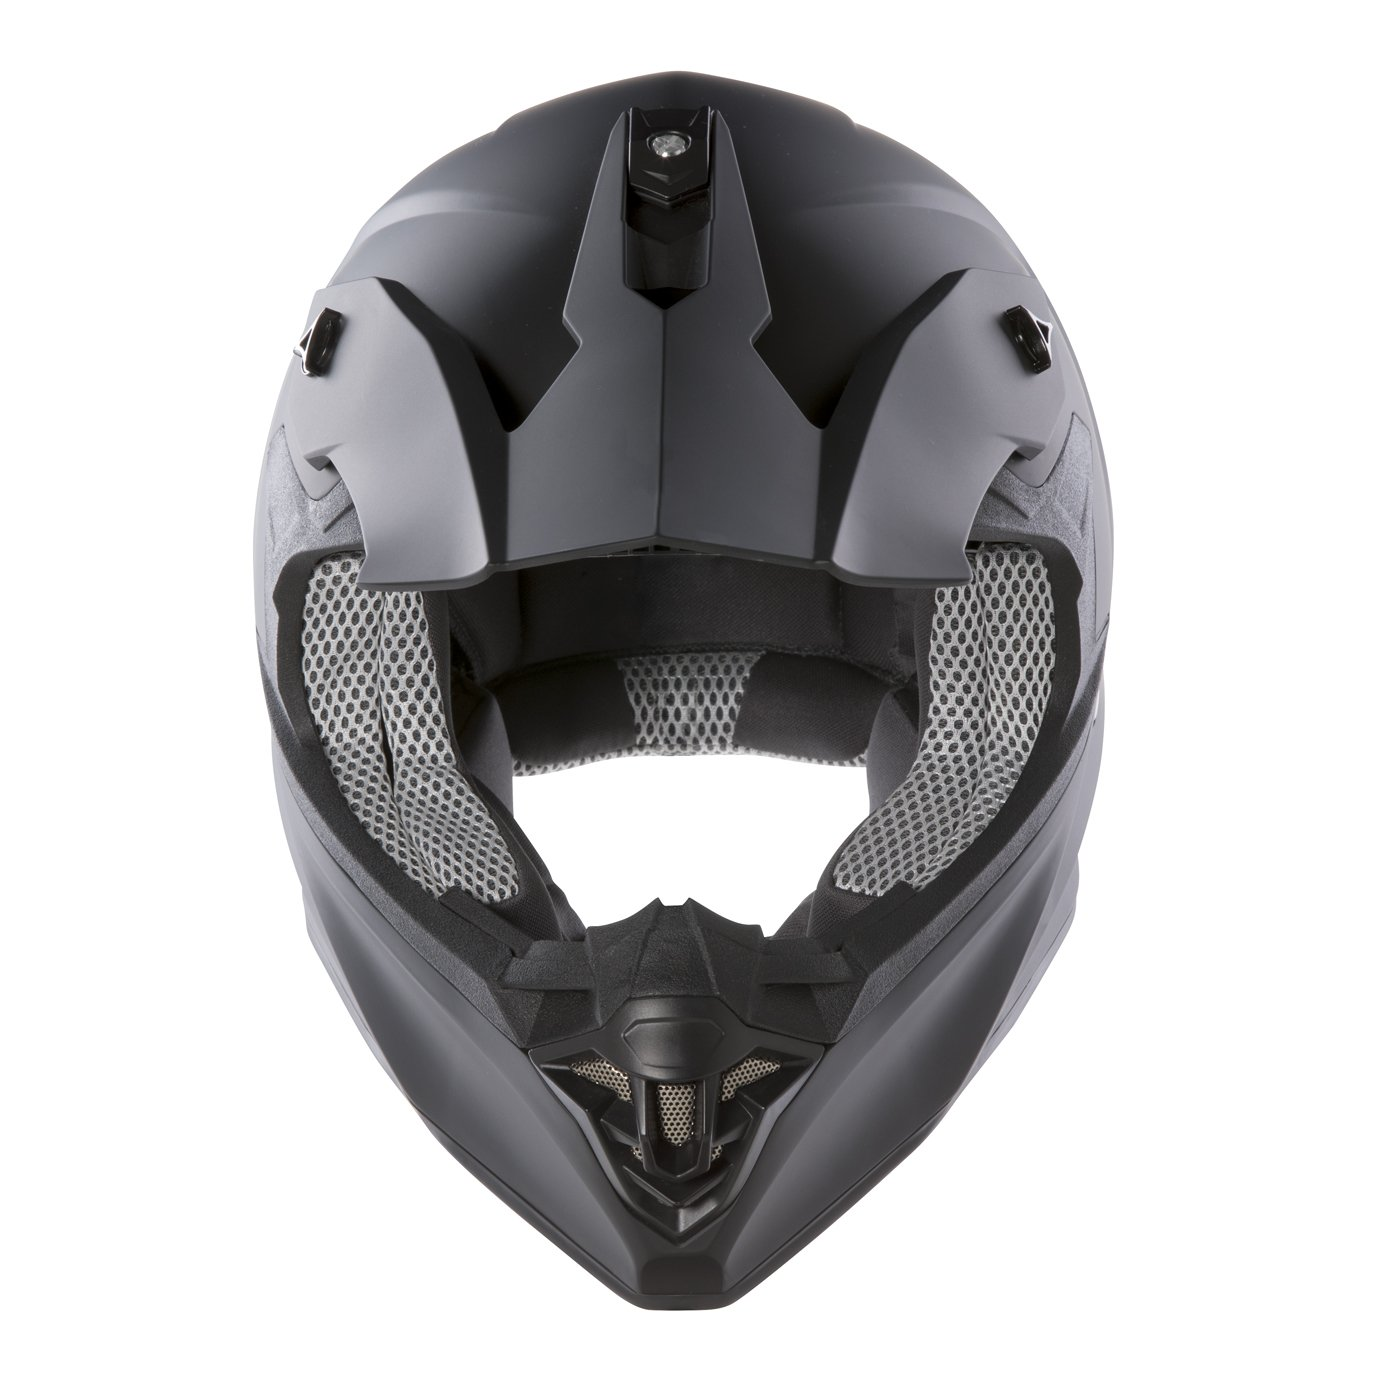 M Panthera Moto Cross FS607 Nero Opaco Casco moto